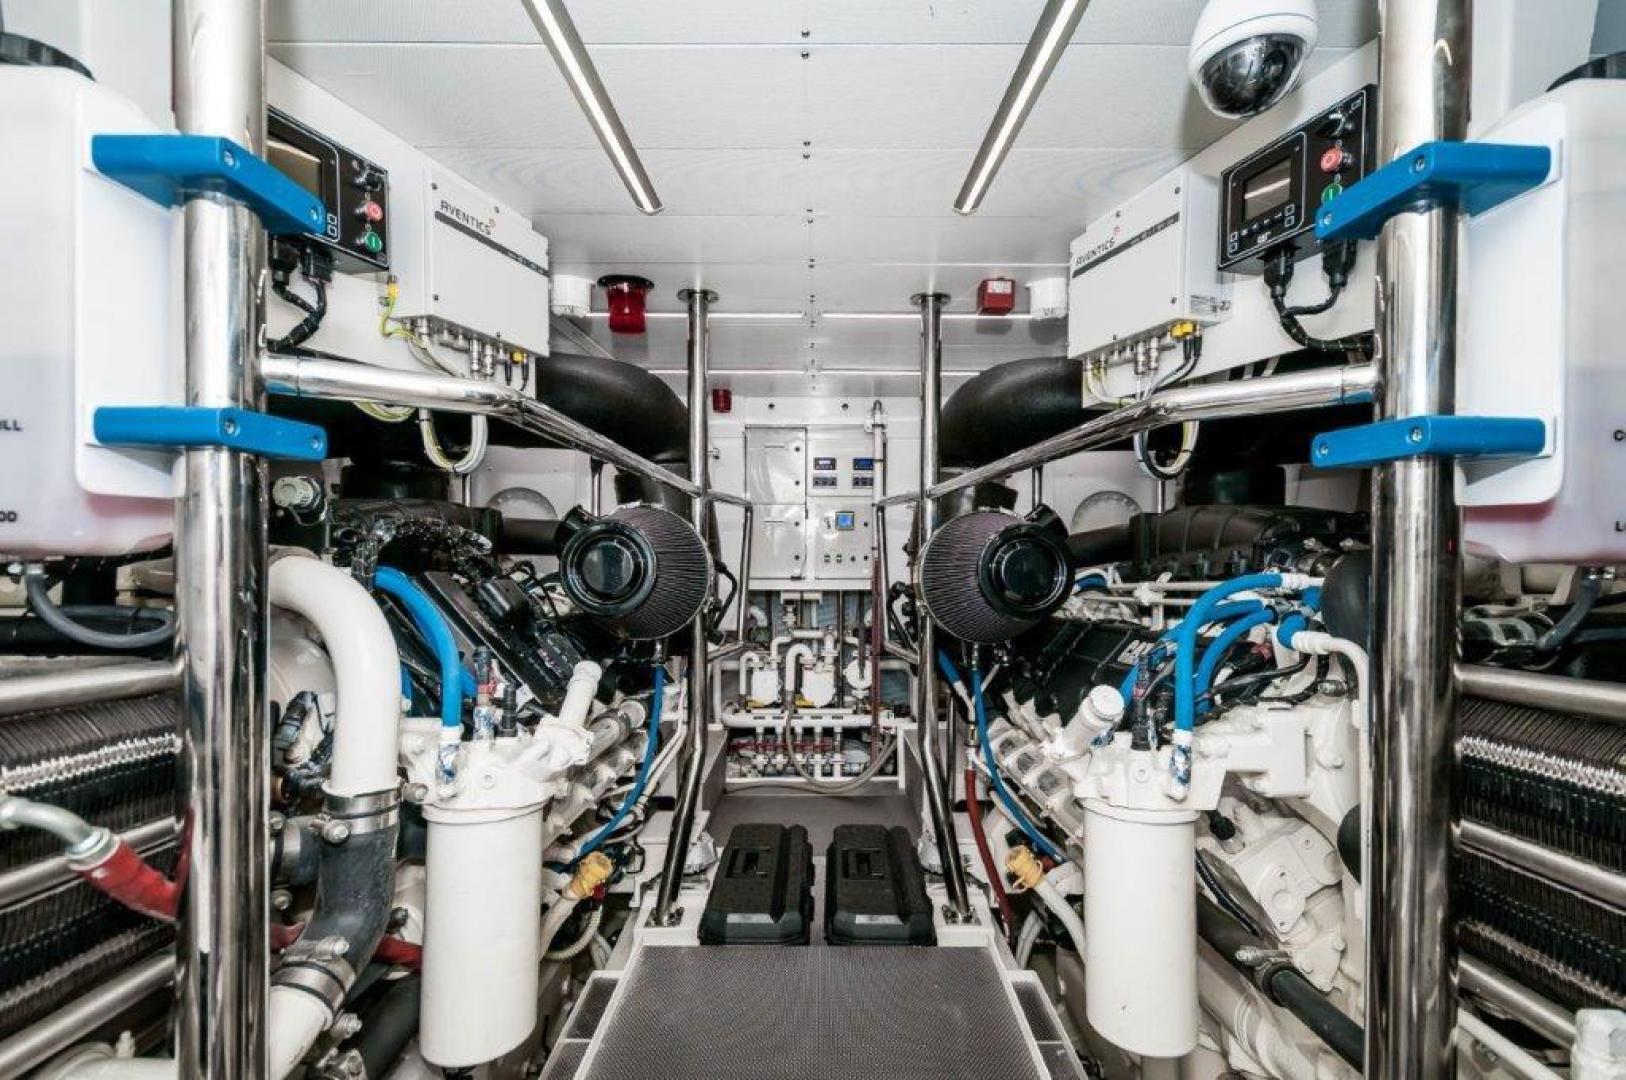 Maiora-84 Motor Yacht 2015-Never Rest SANDESTIN-Florida-United States-2015 Maiora 84 Motor Yacht Engine Room Never Rest-720613 | Thumbnail